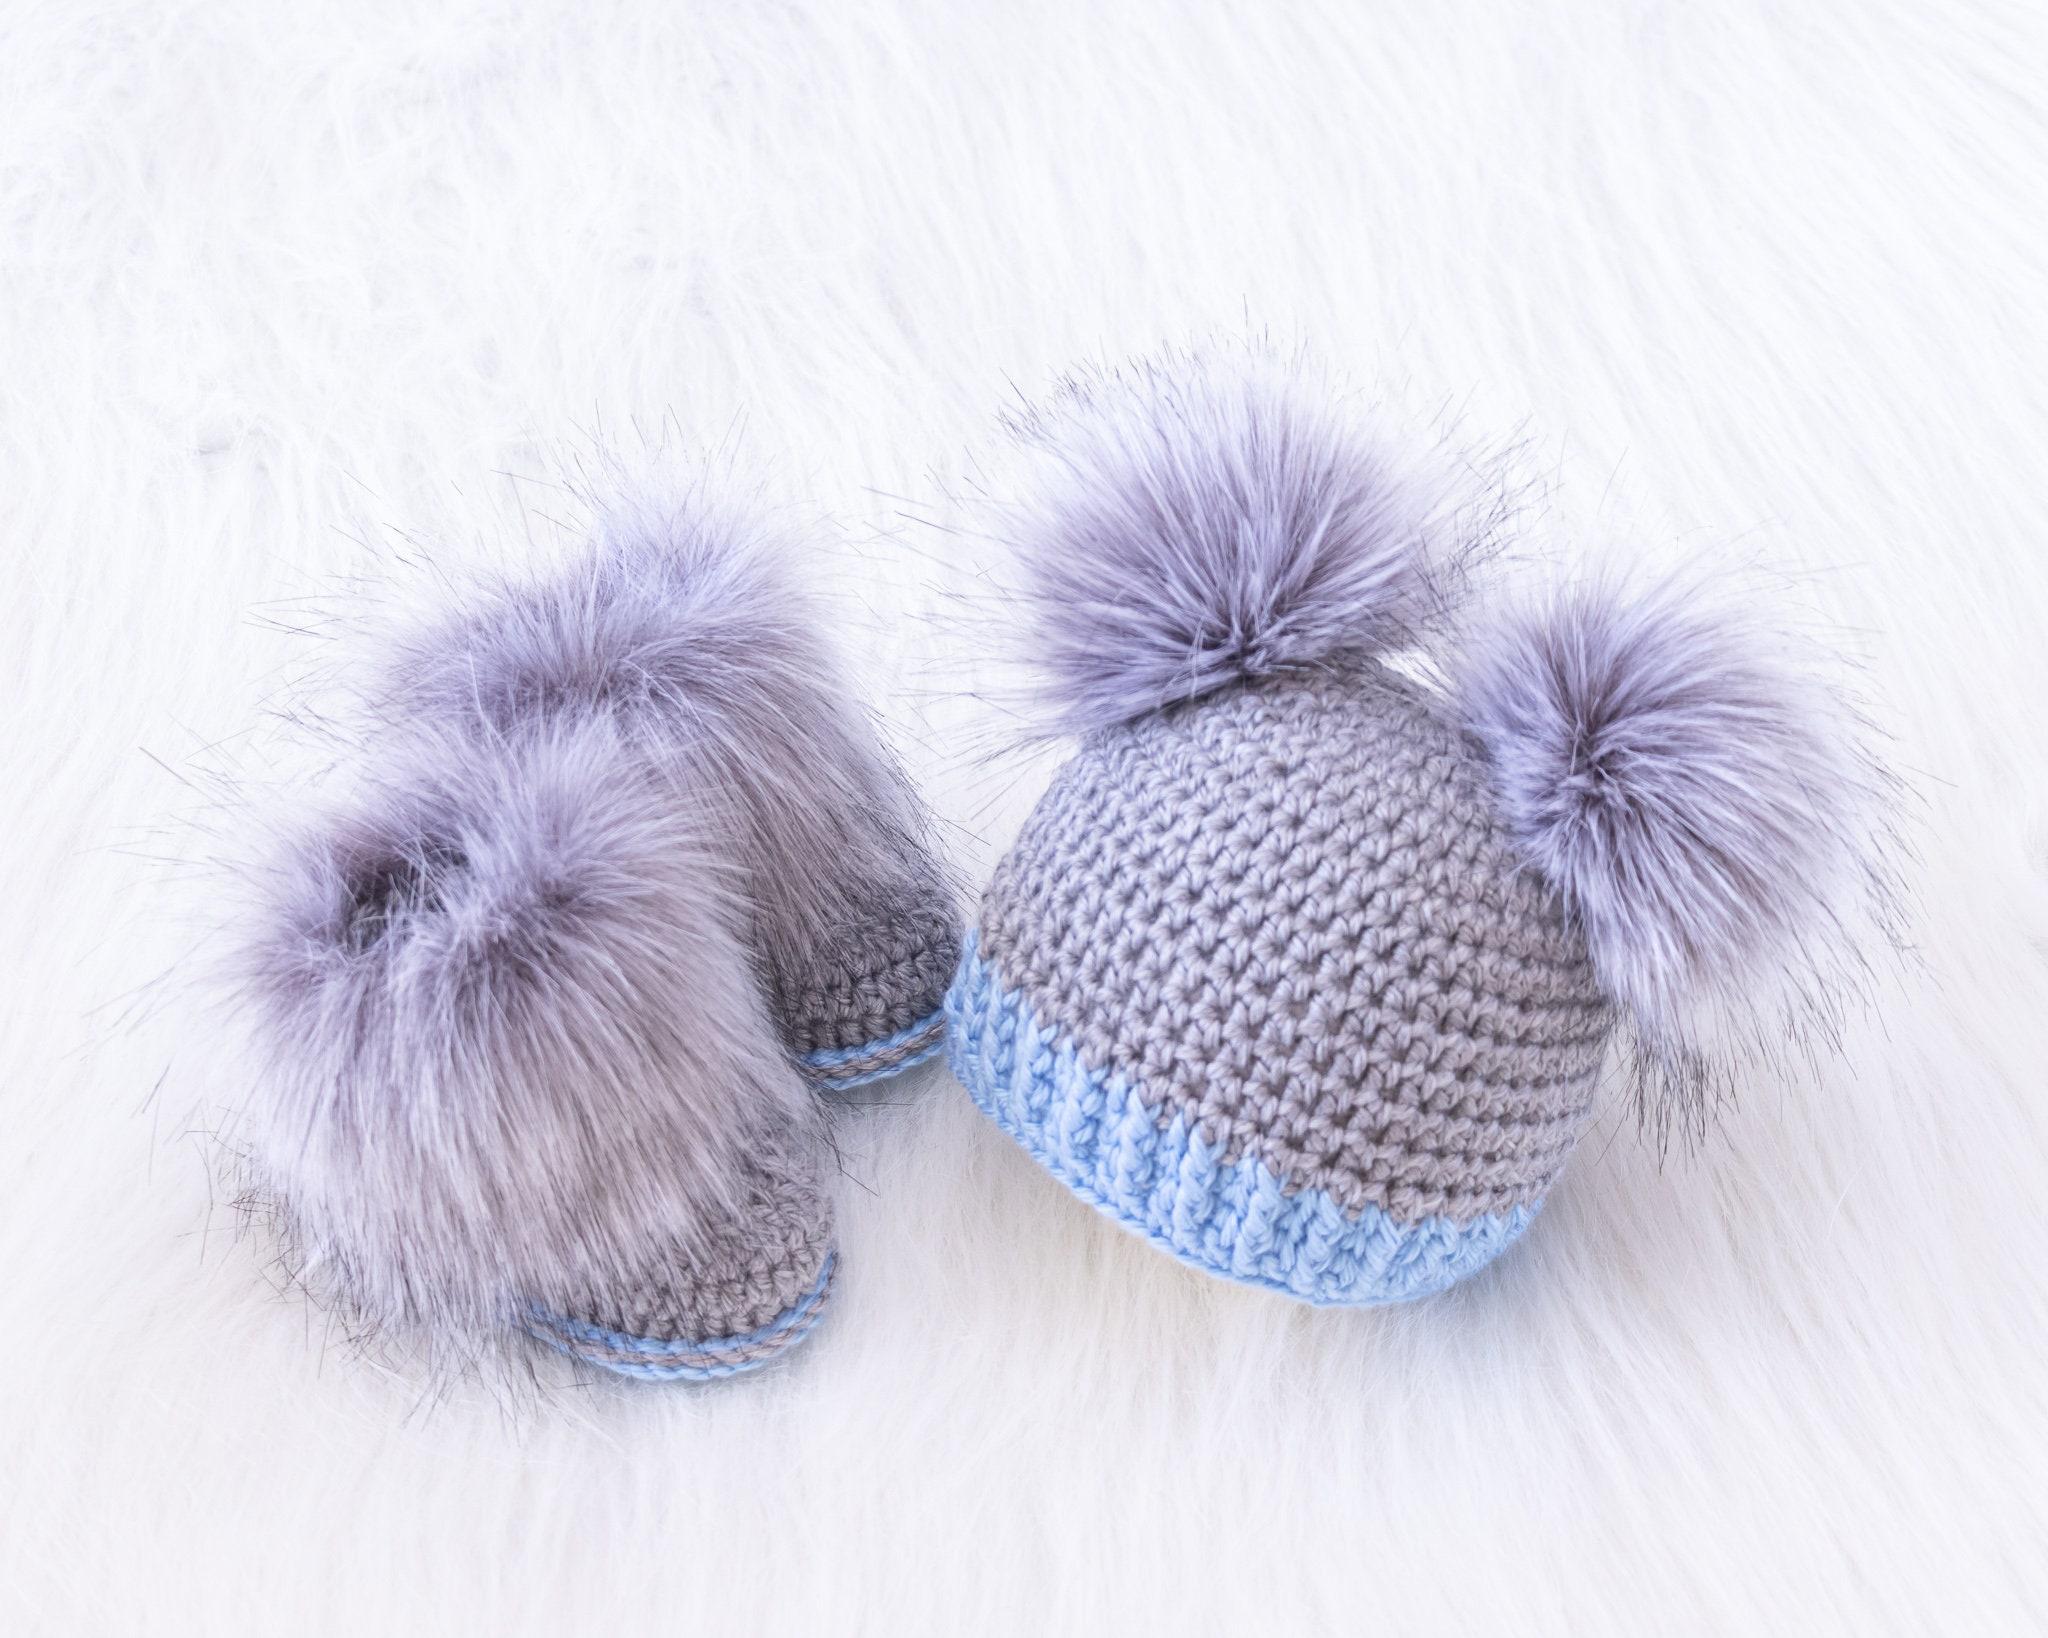 Handmade Crochet Baby Hat booties Preemie Newborn 0-3 months Blue Set